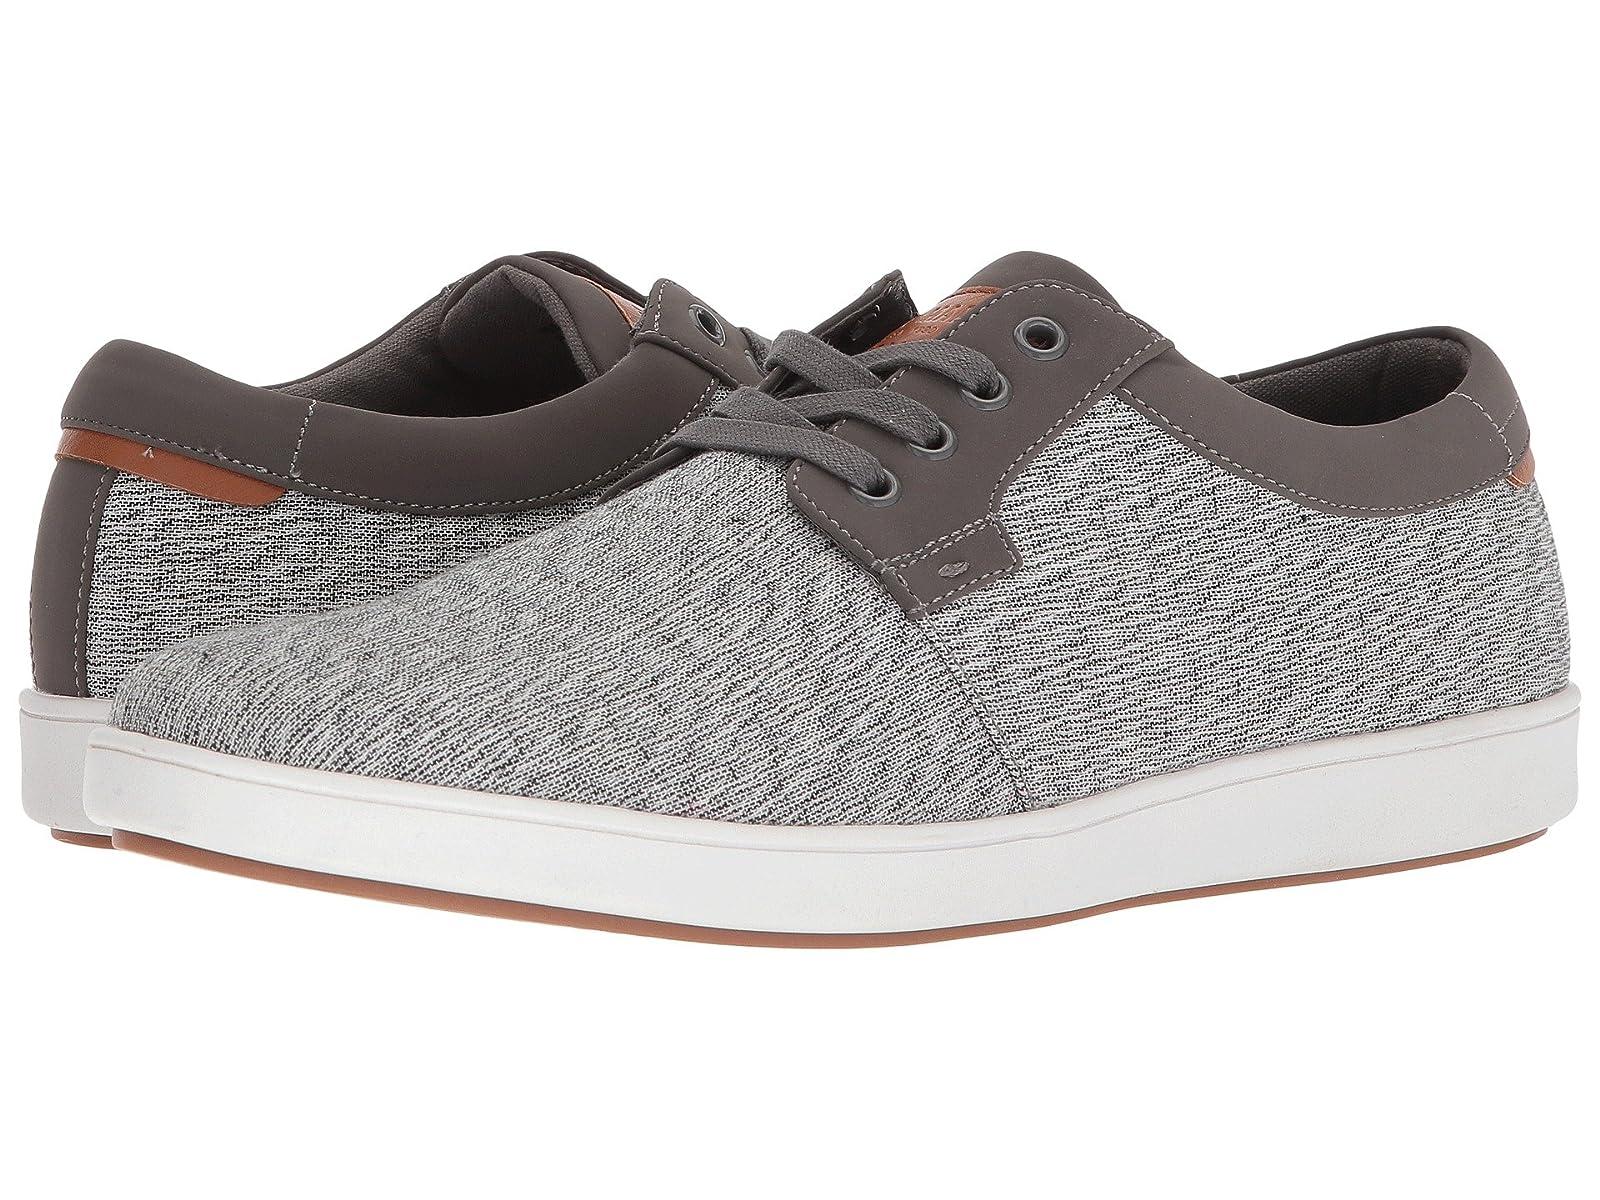 Steve Madden FreshmanAtmospheric grades have affordable shoes